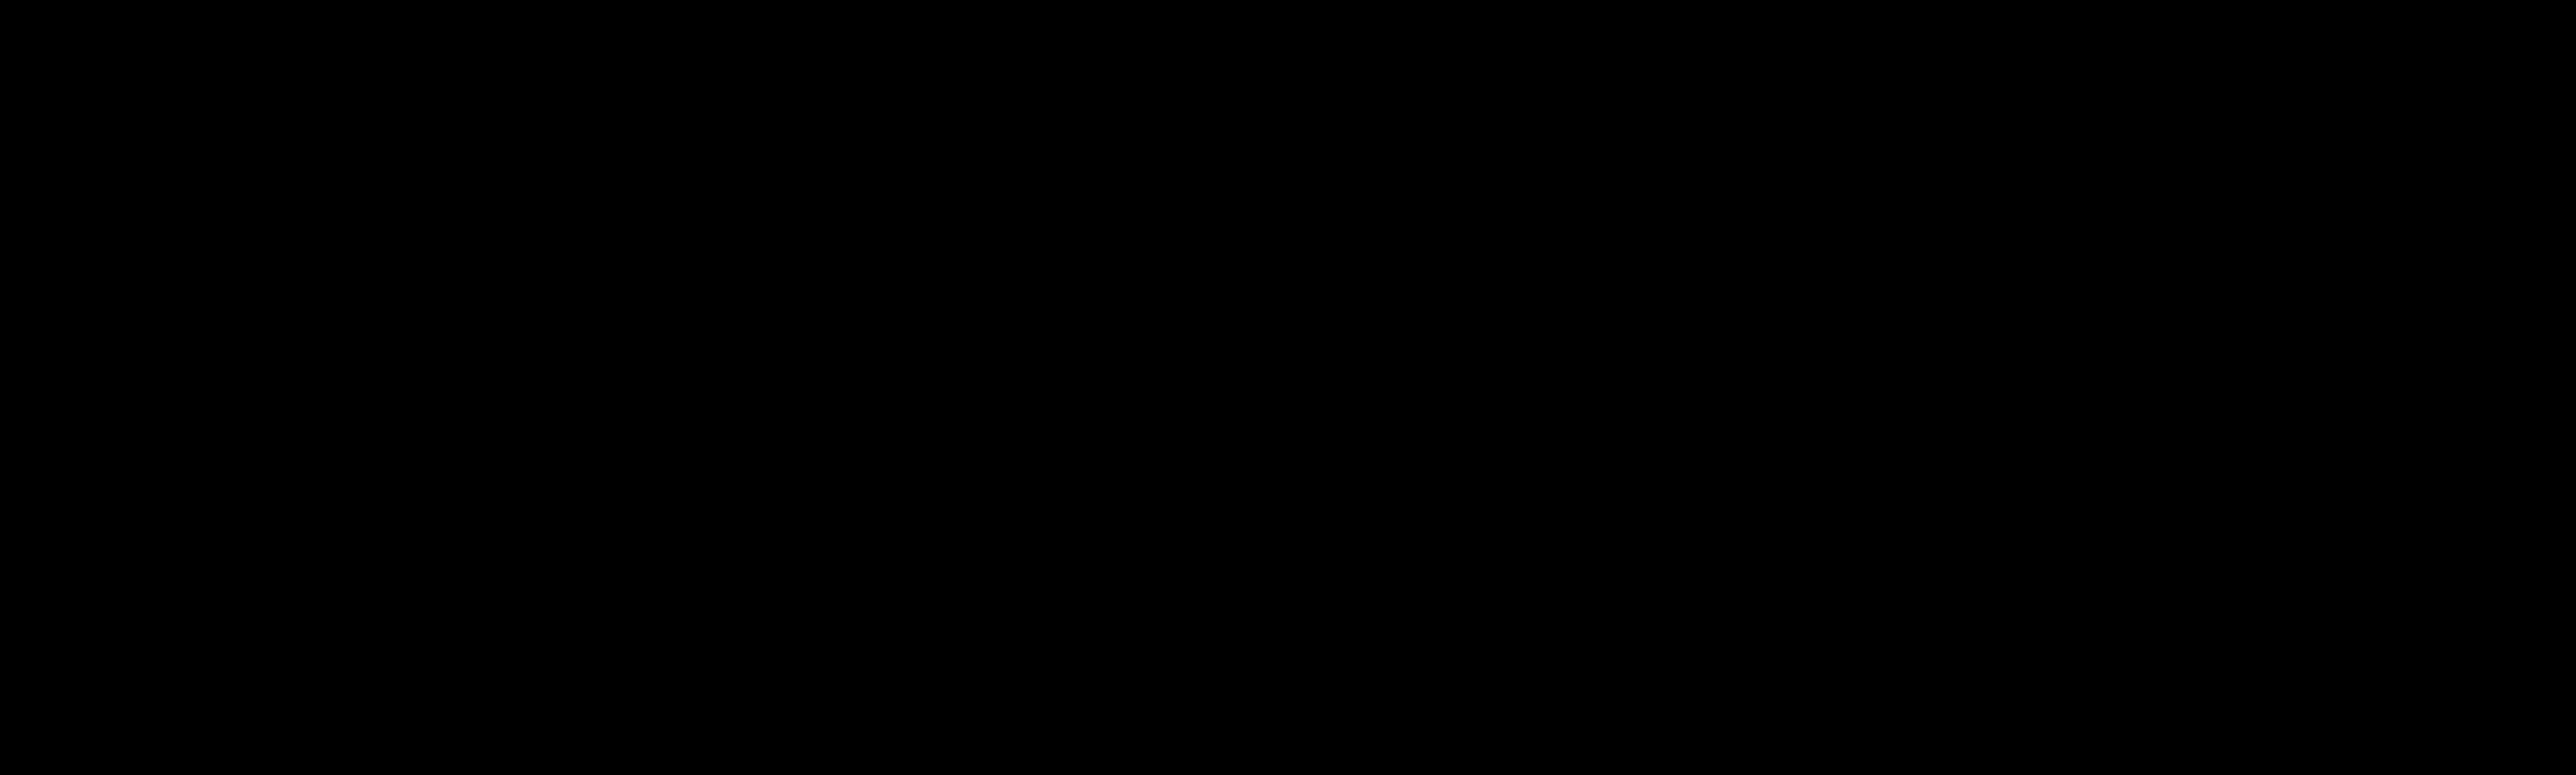 N-Feruloyl serotonin-mono-β-D-glucopyranoside-d<sub>3</sub>